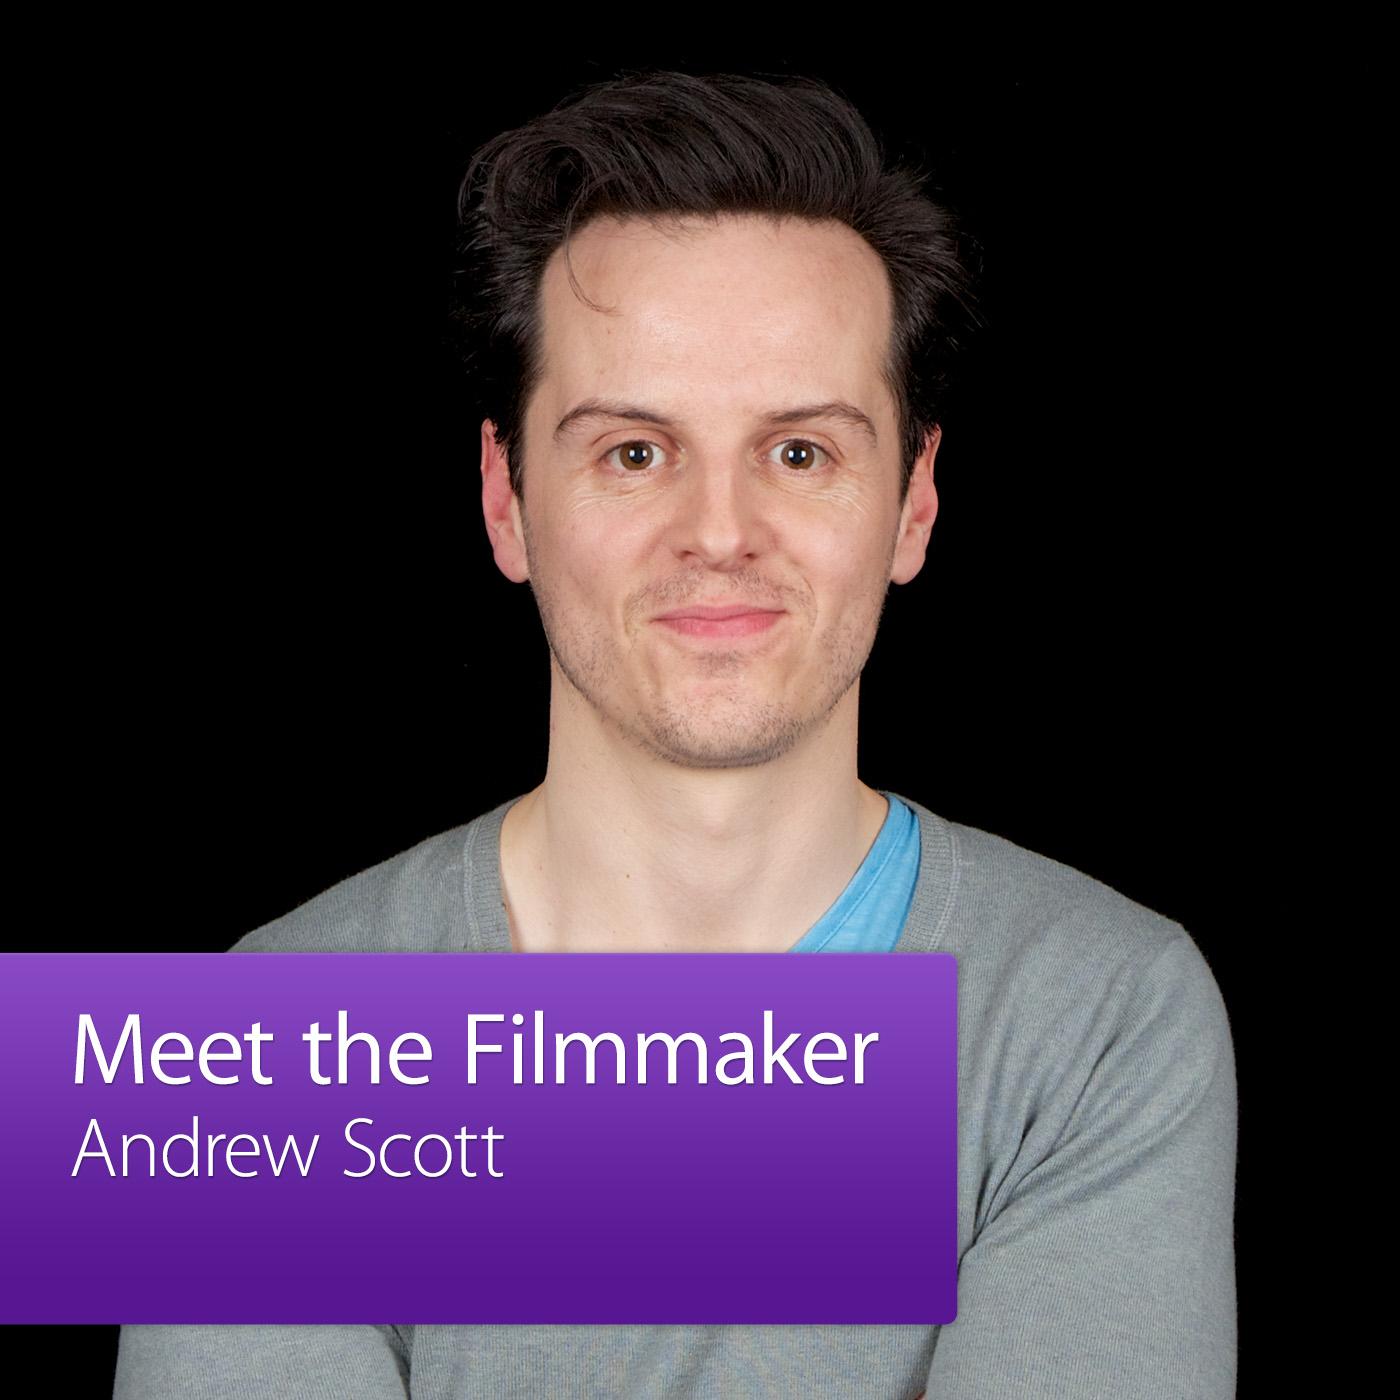 Andrew Scott: Meet the Filmmaker